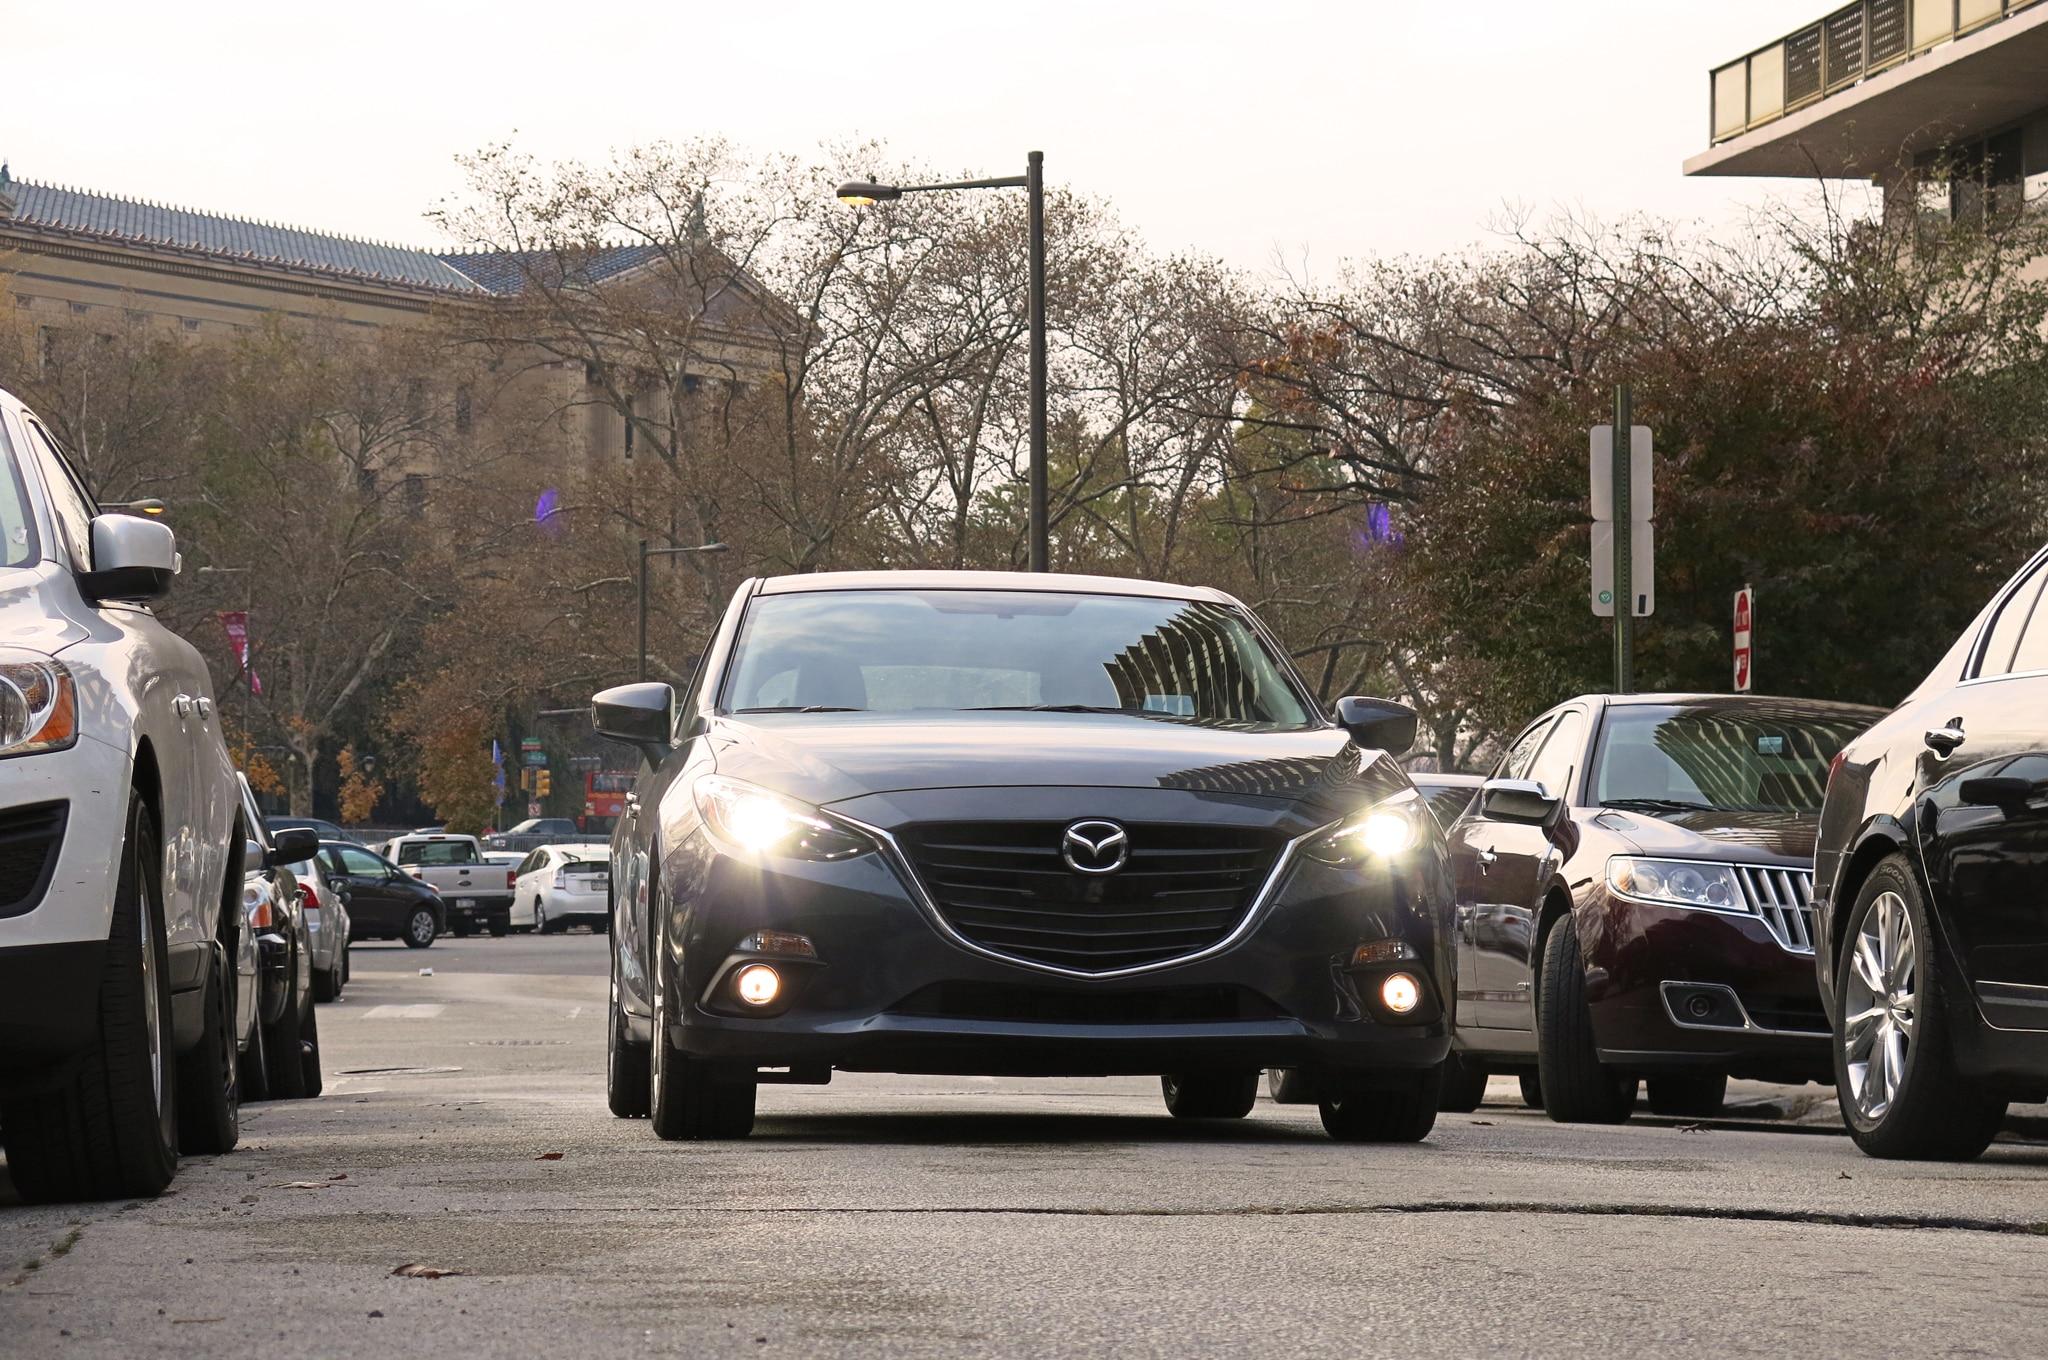 2014 Mazda3 Four Seasons Philadelphia 11 Front In Motion